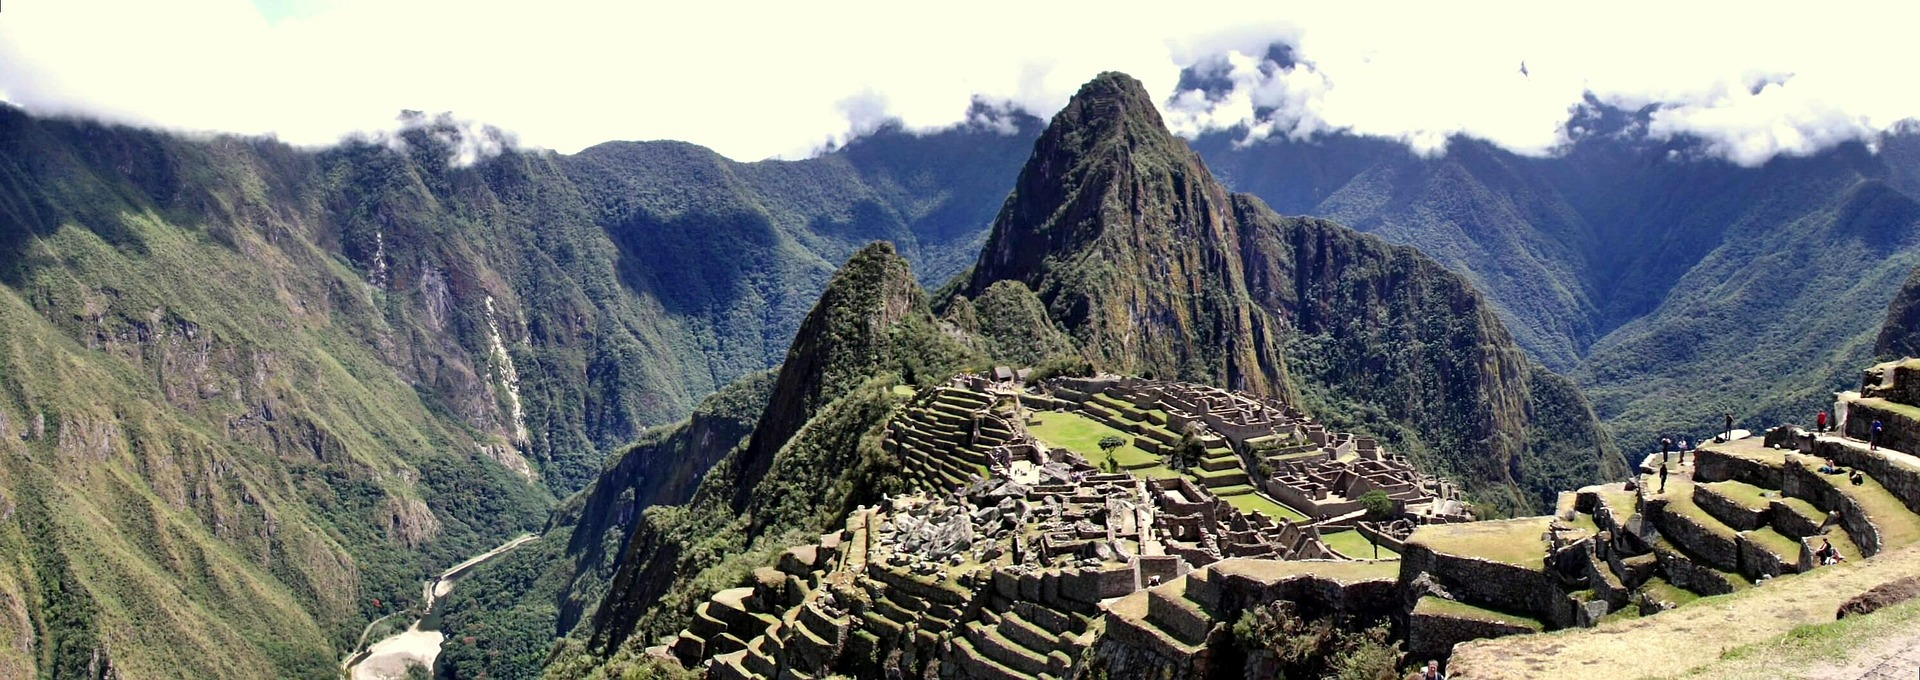 Le village du Machu Pichu